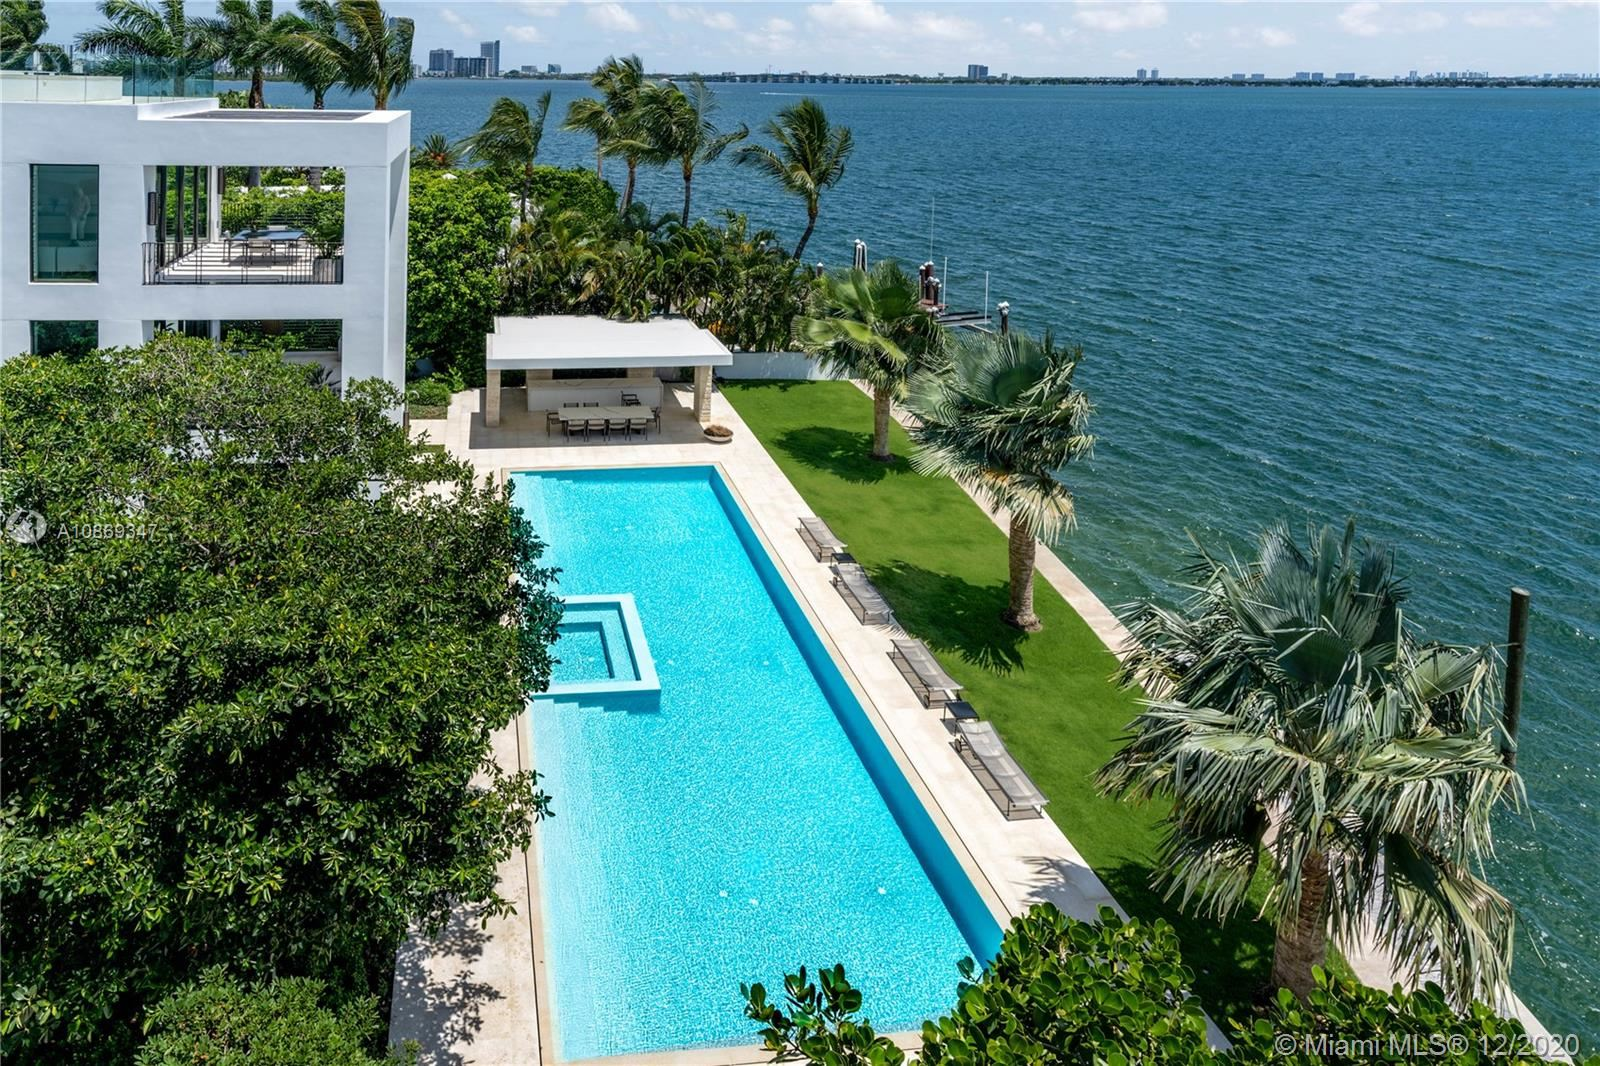 Photo 6 of Listing MLS a10869347 in 1429 N Venetian Way Miami FL 33139